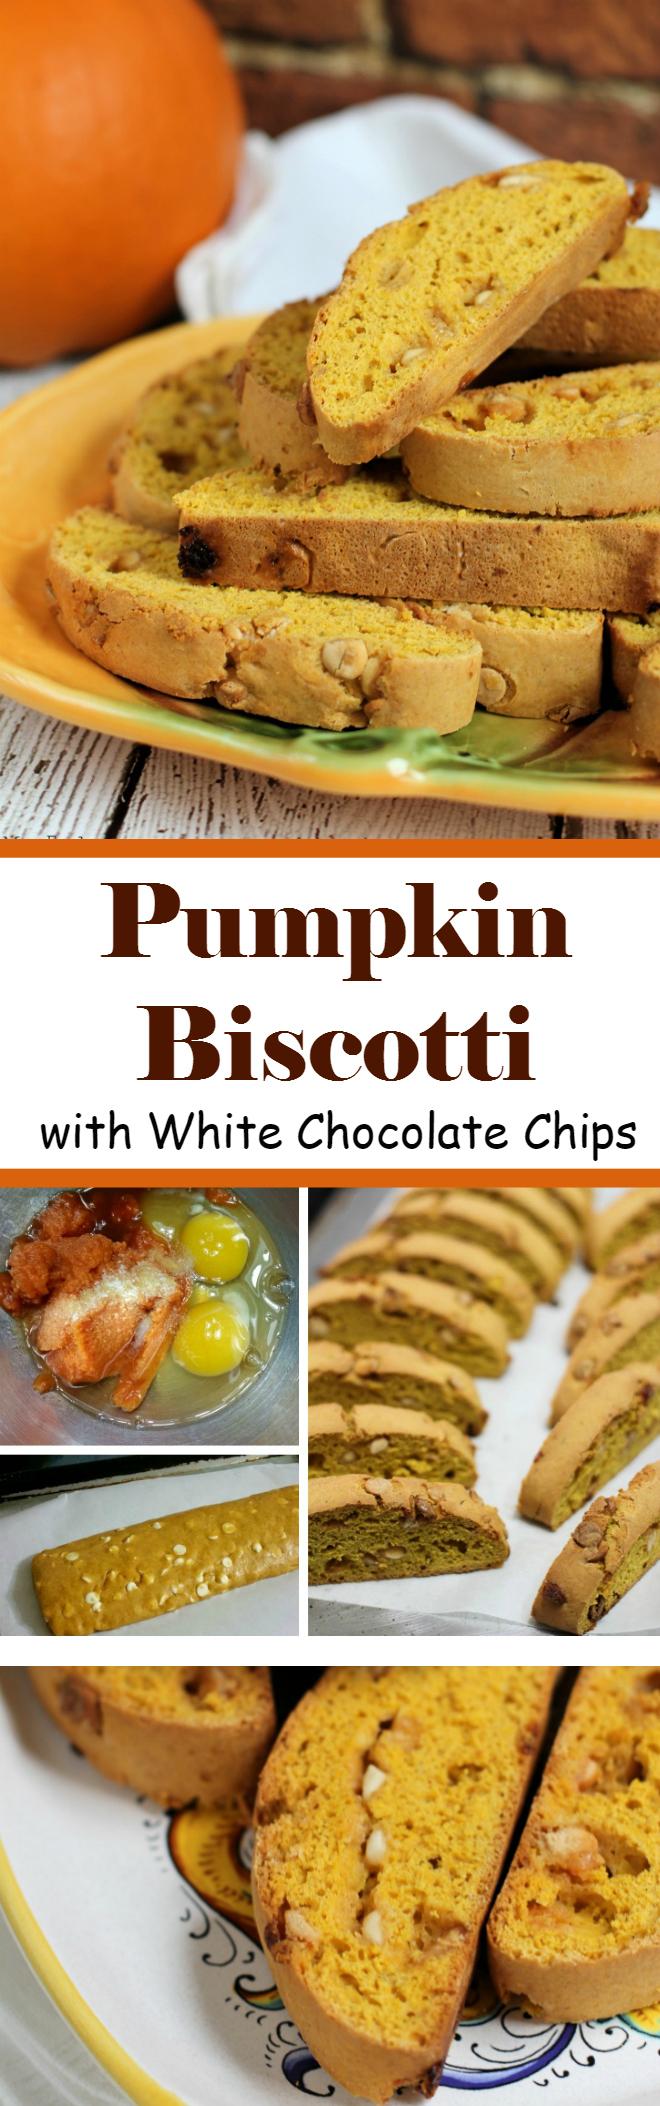 Pumpkin Biscotti with White Chocolate Chips